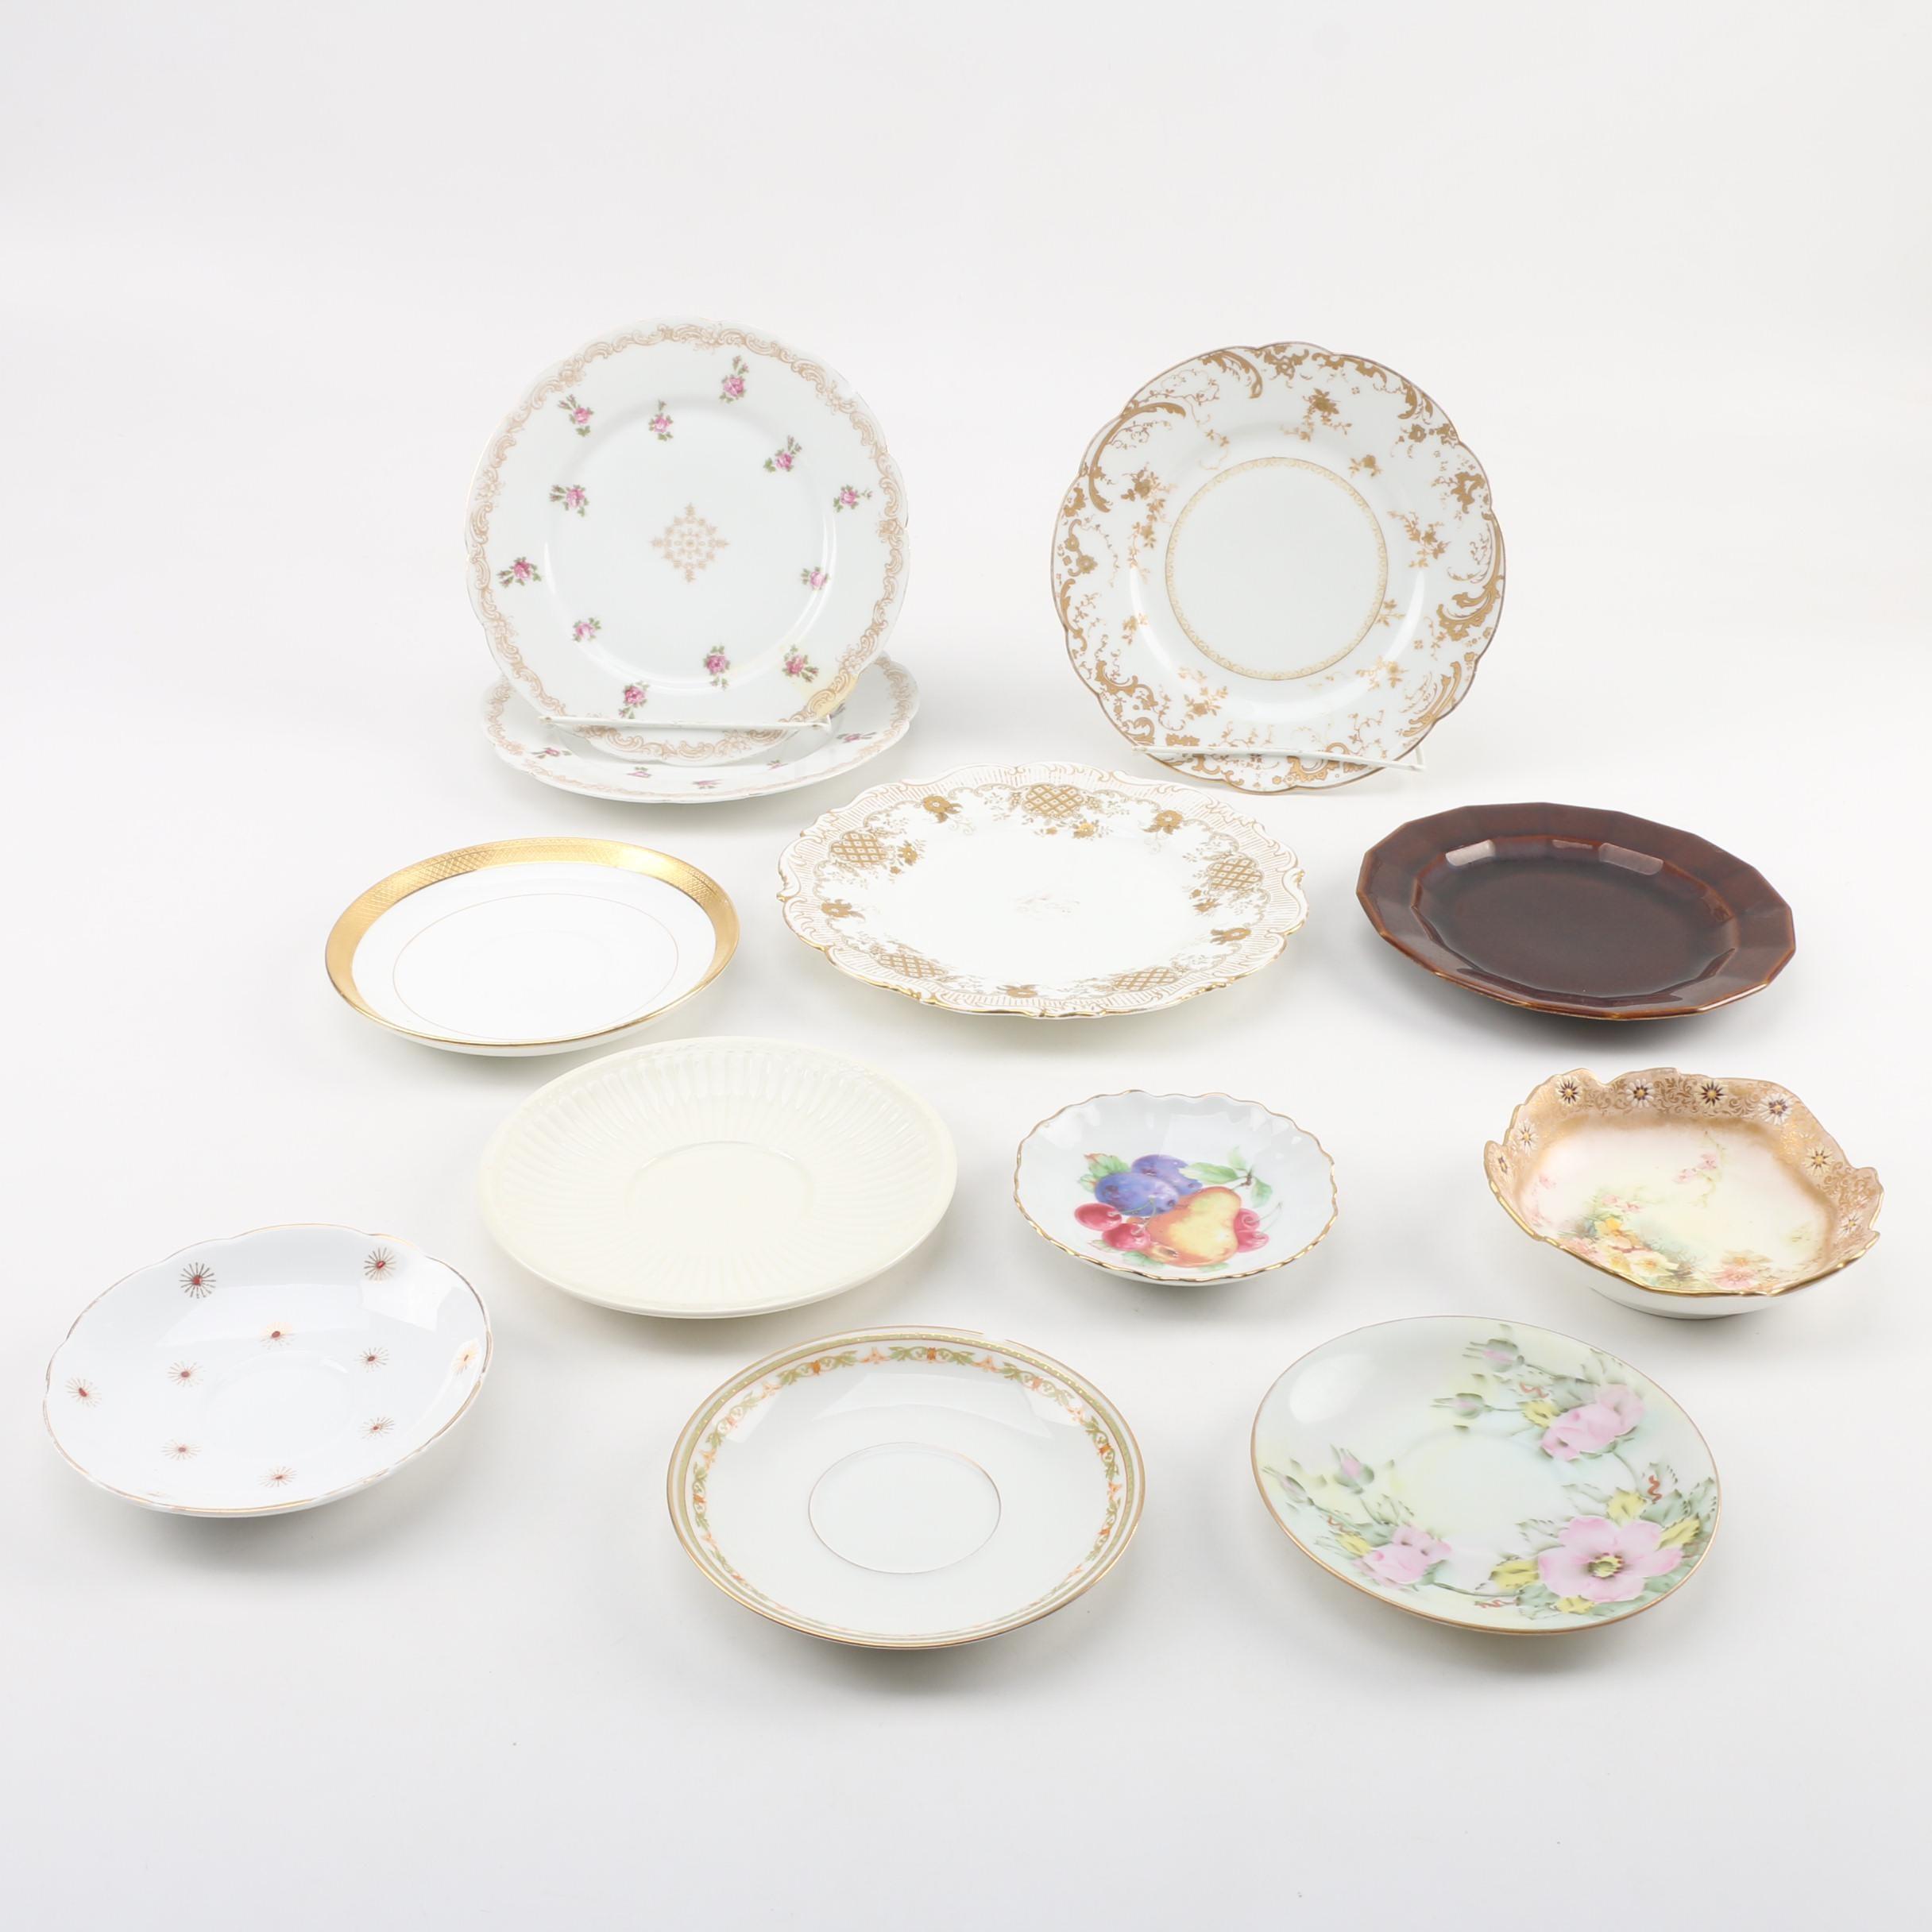 Vintage Porcelain and Earthenware Plates featuring Haviland Limoges